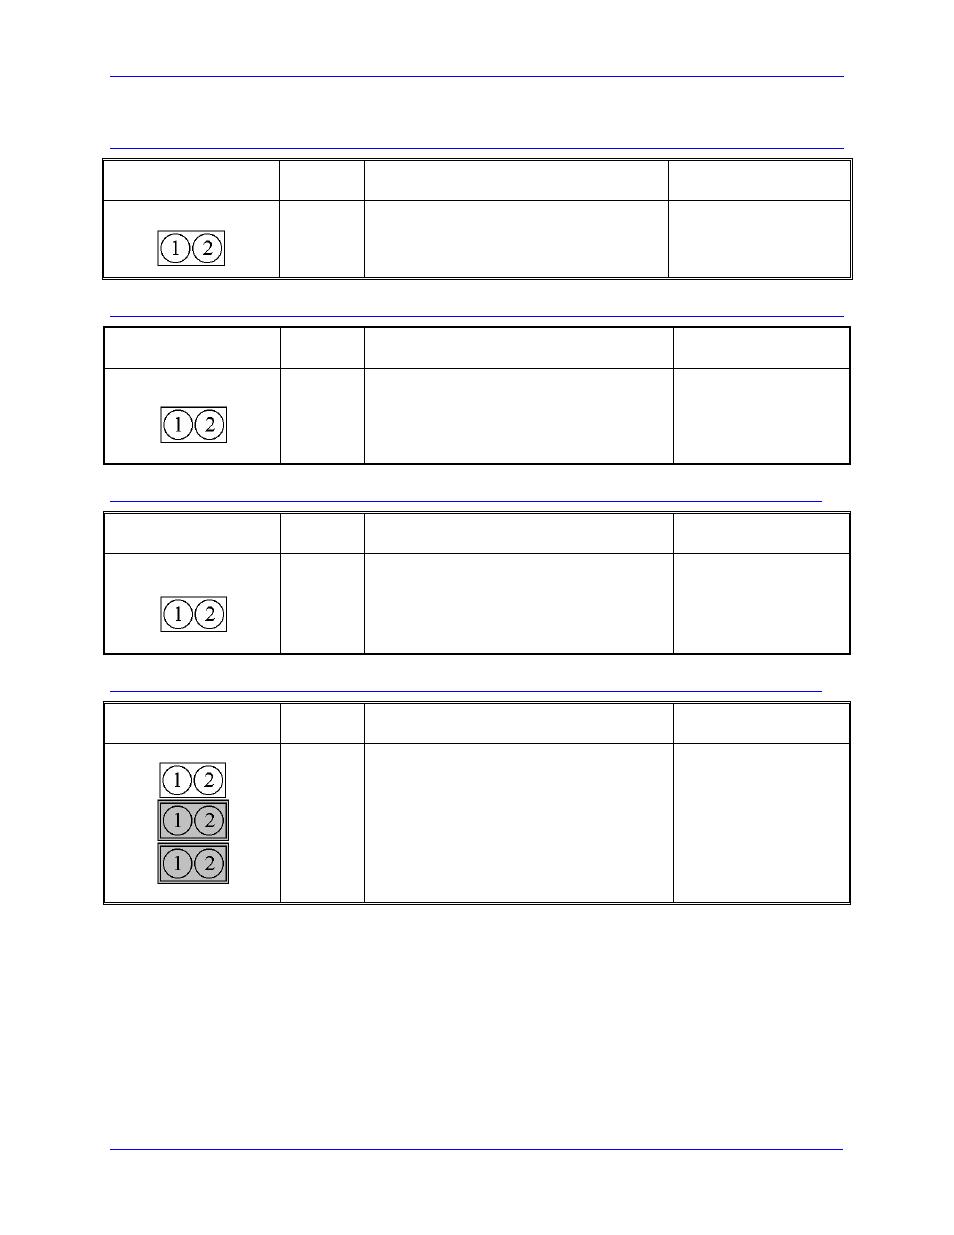 E4: cpu frequency select, E8: phase clock lines output enable, E9